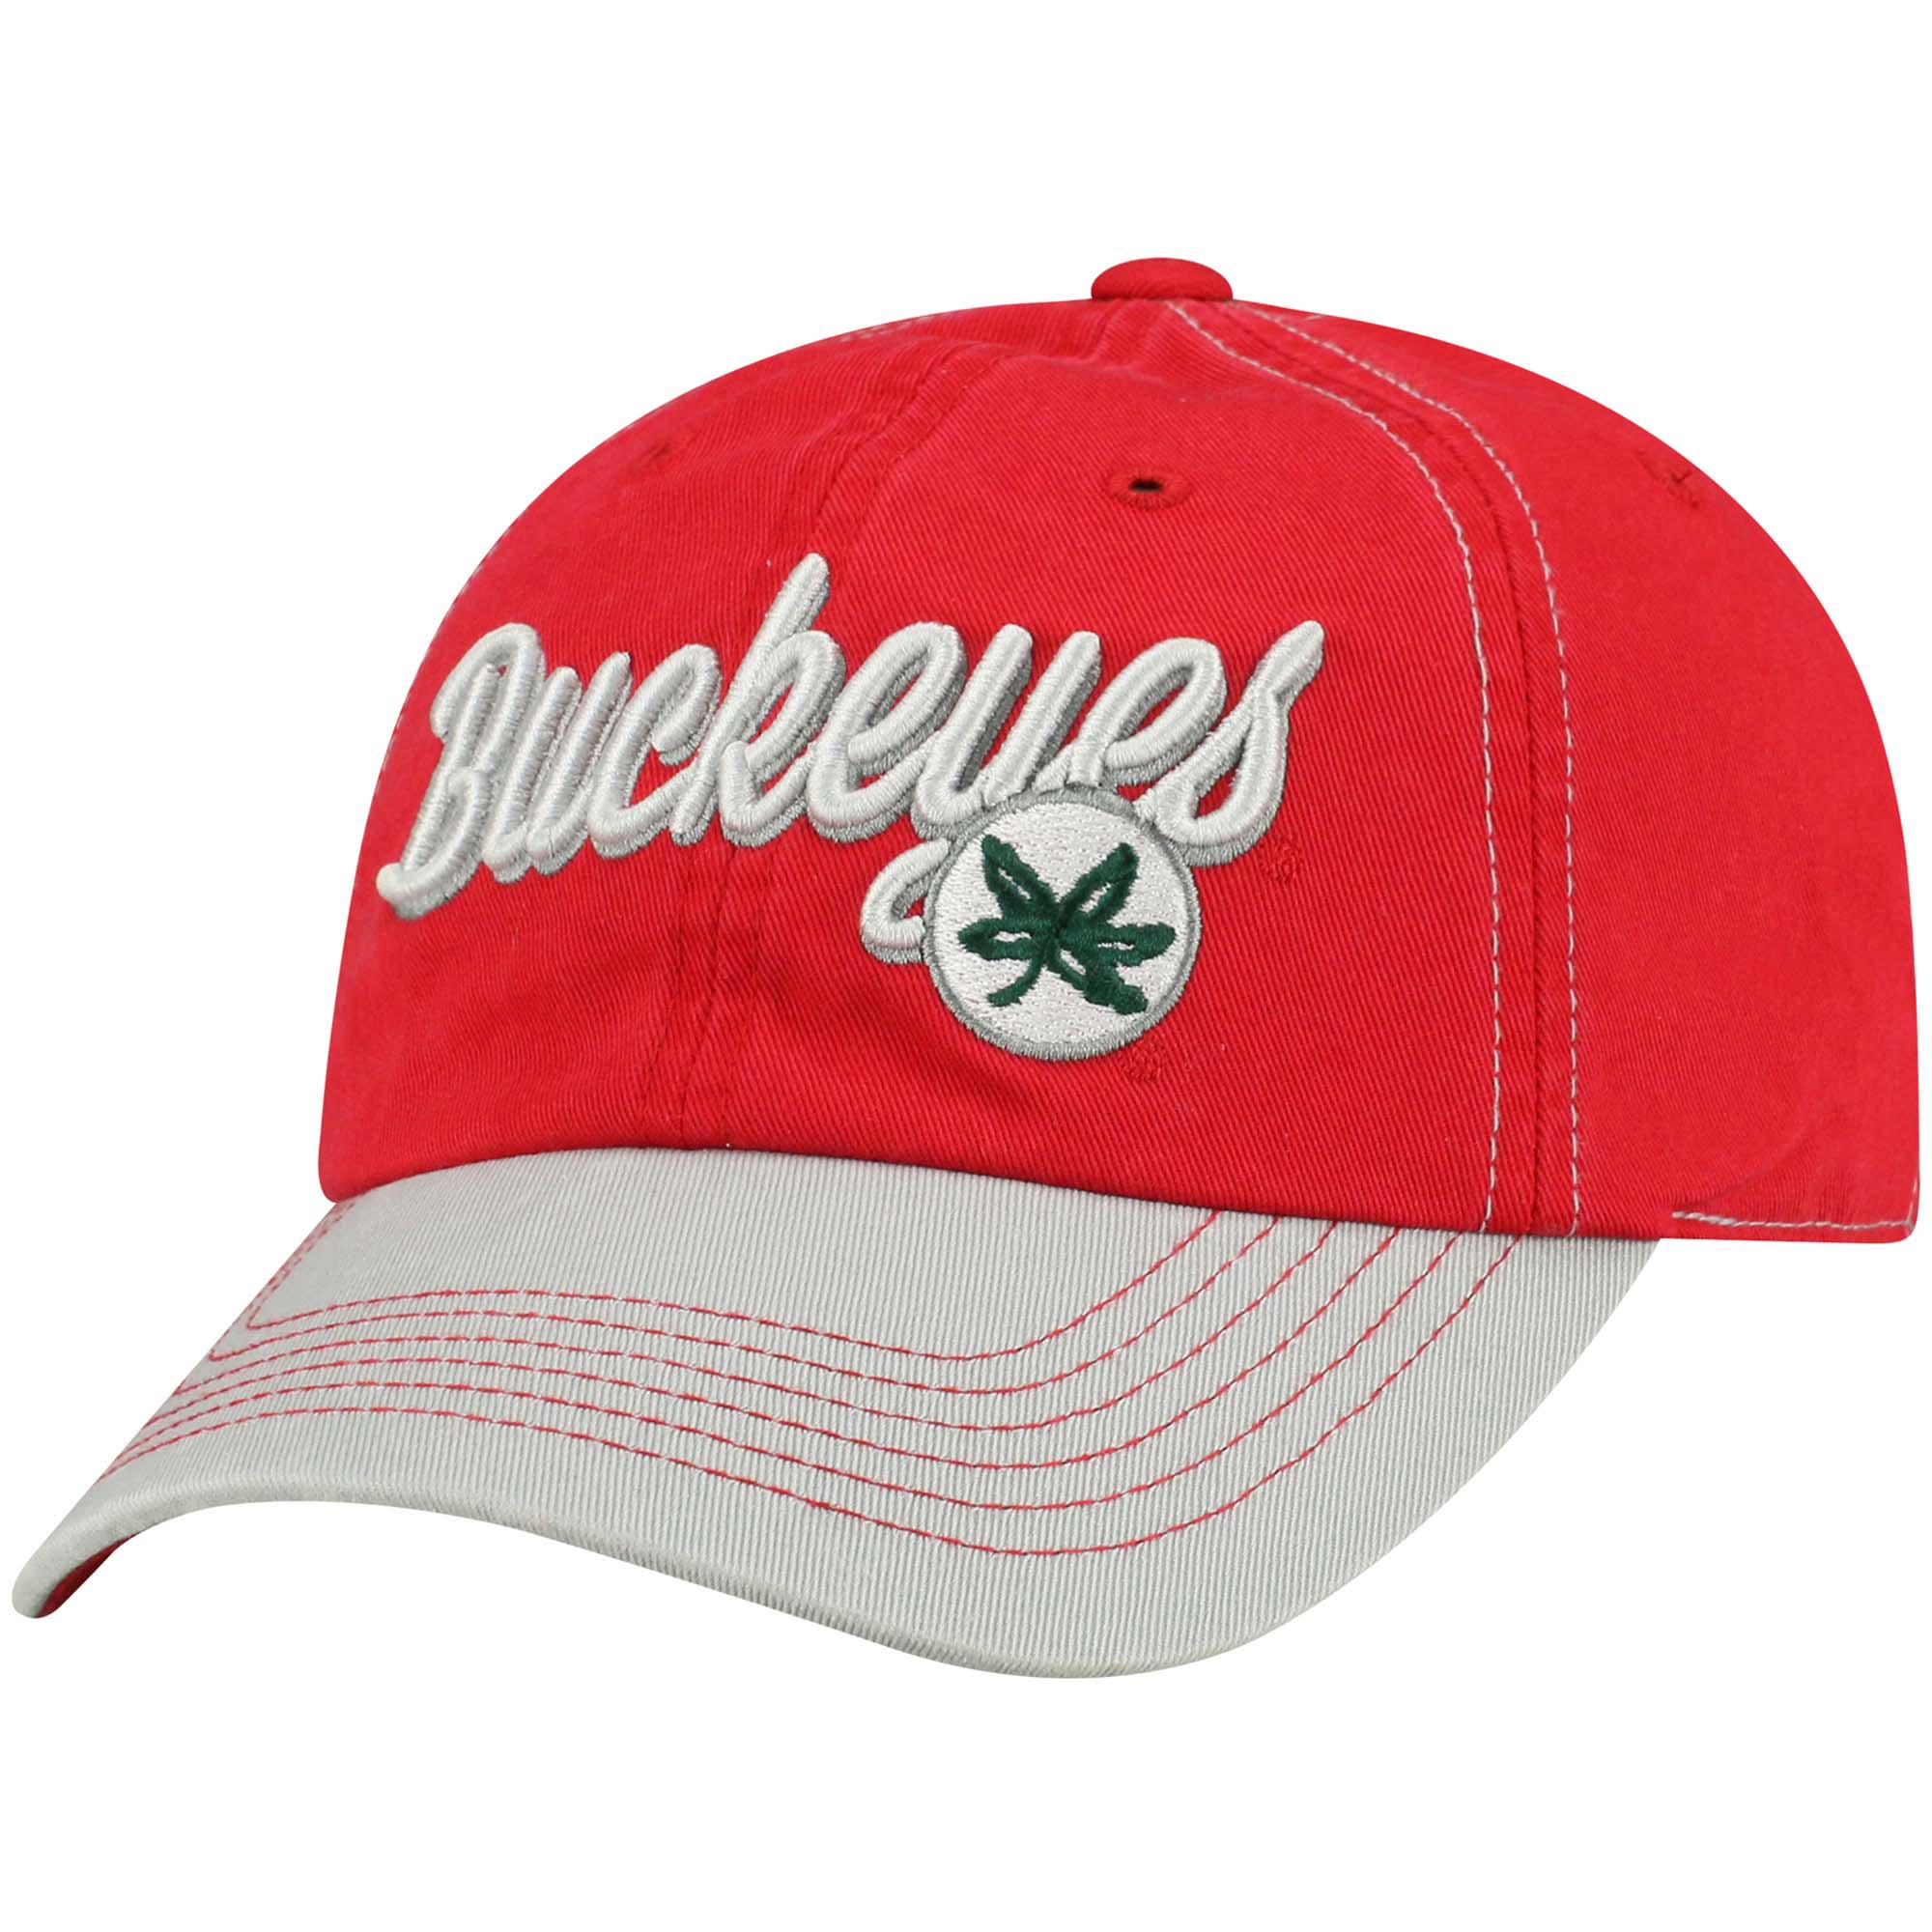 Women's Scarlet Ohio State Buckeyes Sojourn Adjustable Hat - OSFA